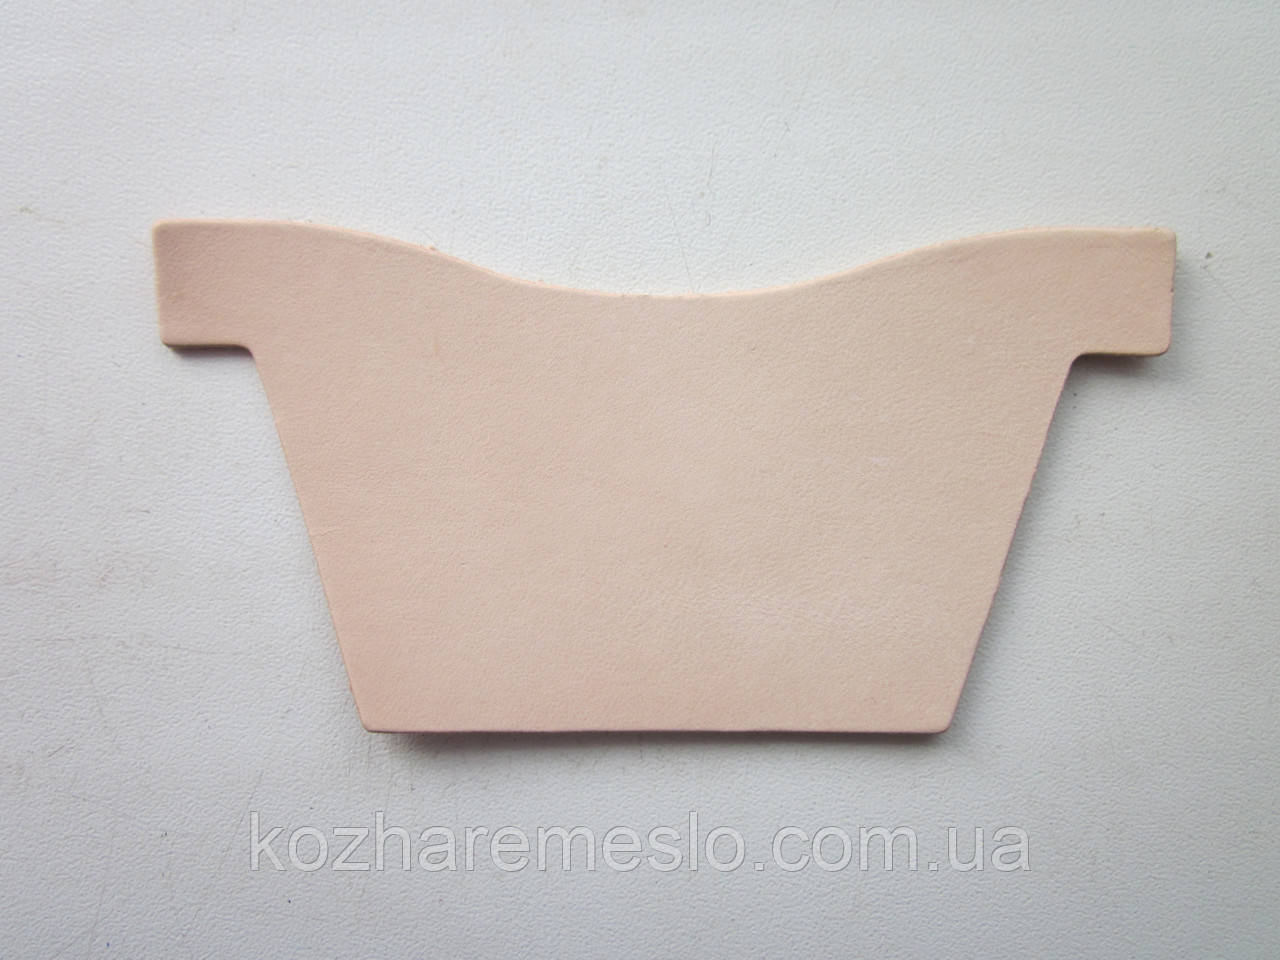 Карман под кредитную карту для кошелька (0.9 -1.1 мм)